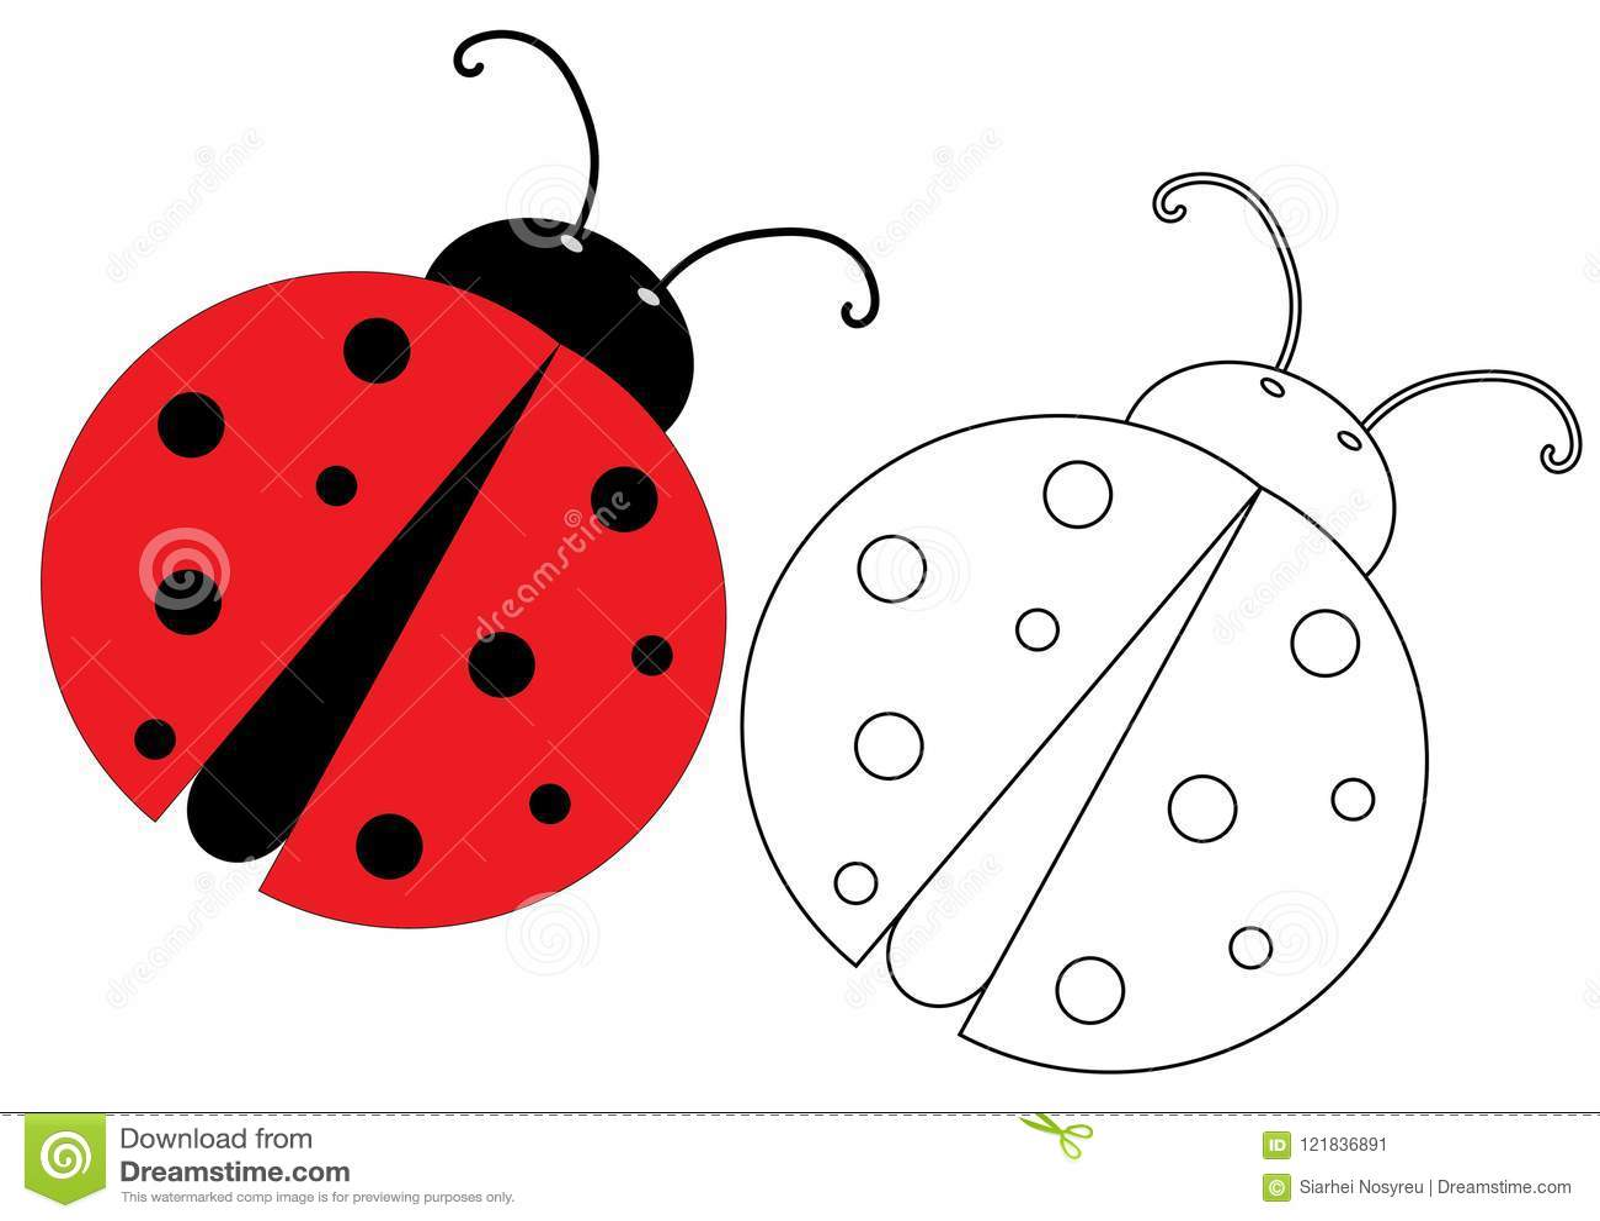 Ladybug Coloring Page Game For Kids Vector Illustration